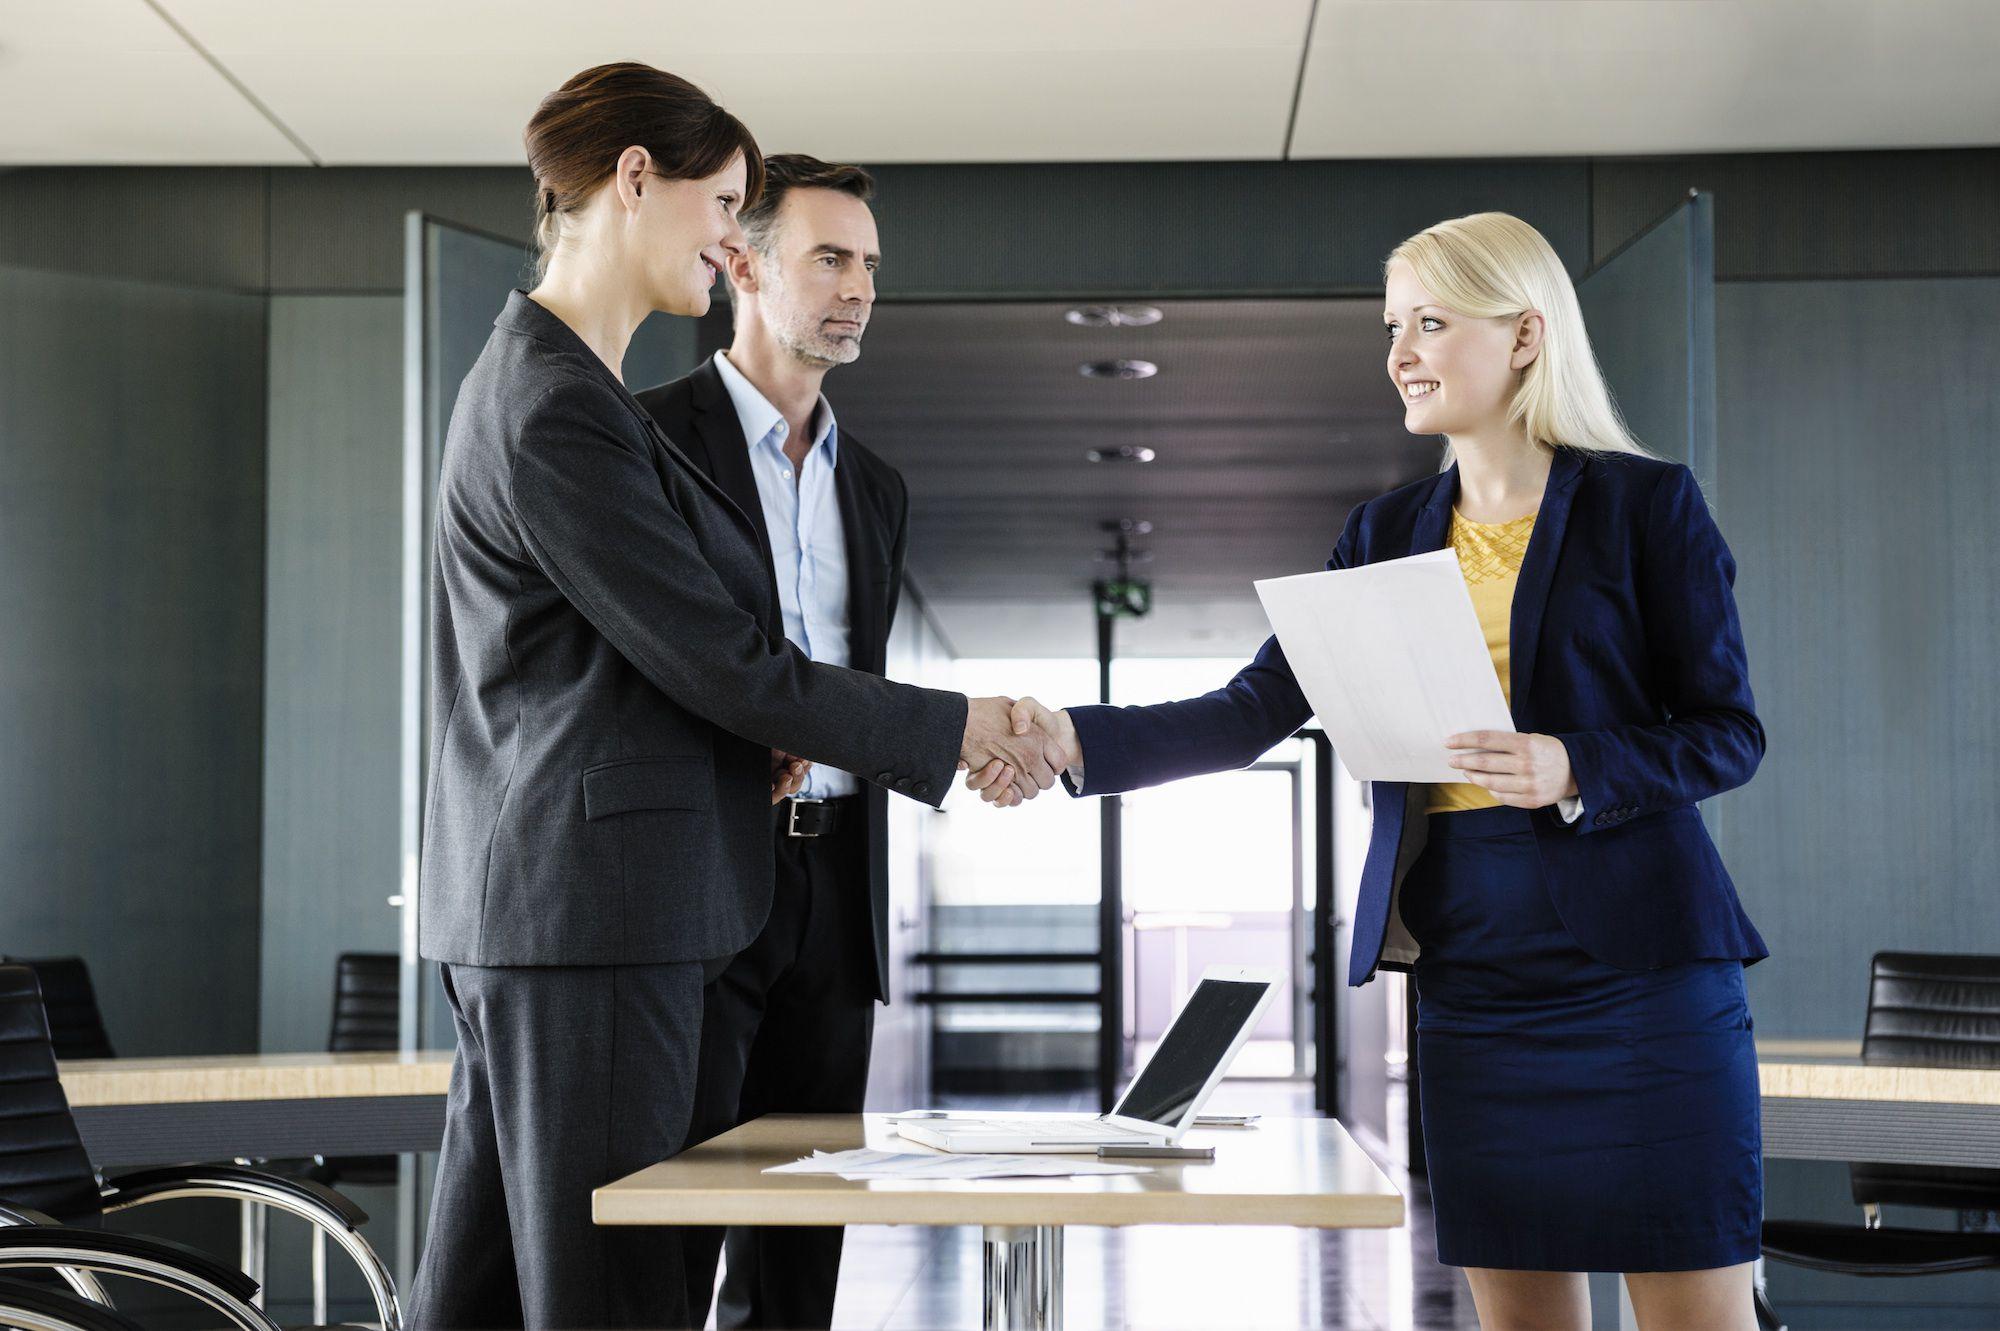 the top 12 soft skills employers seek